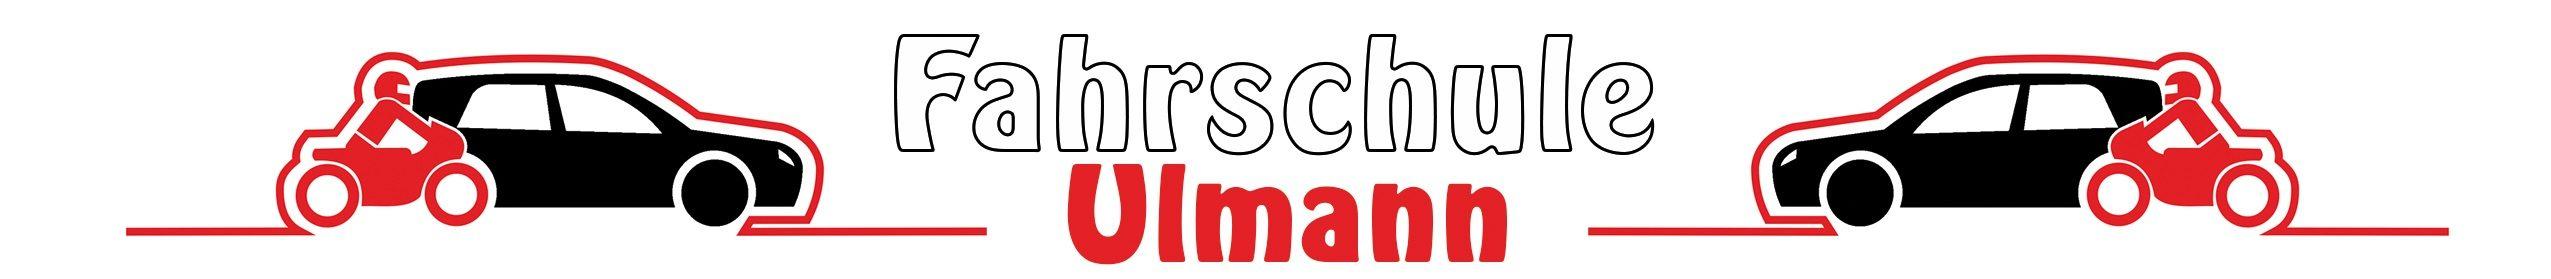 Logo for Fahrschule - Ulmann